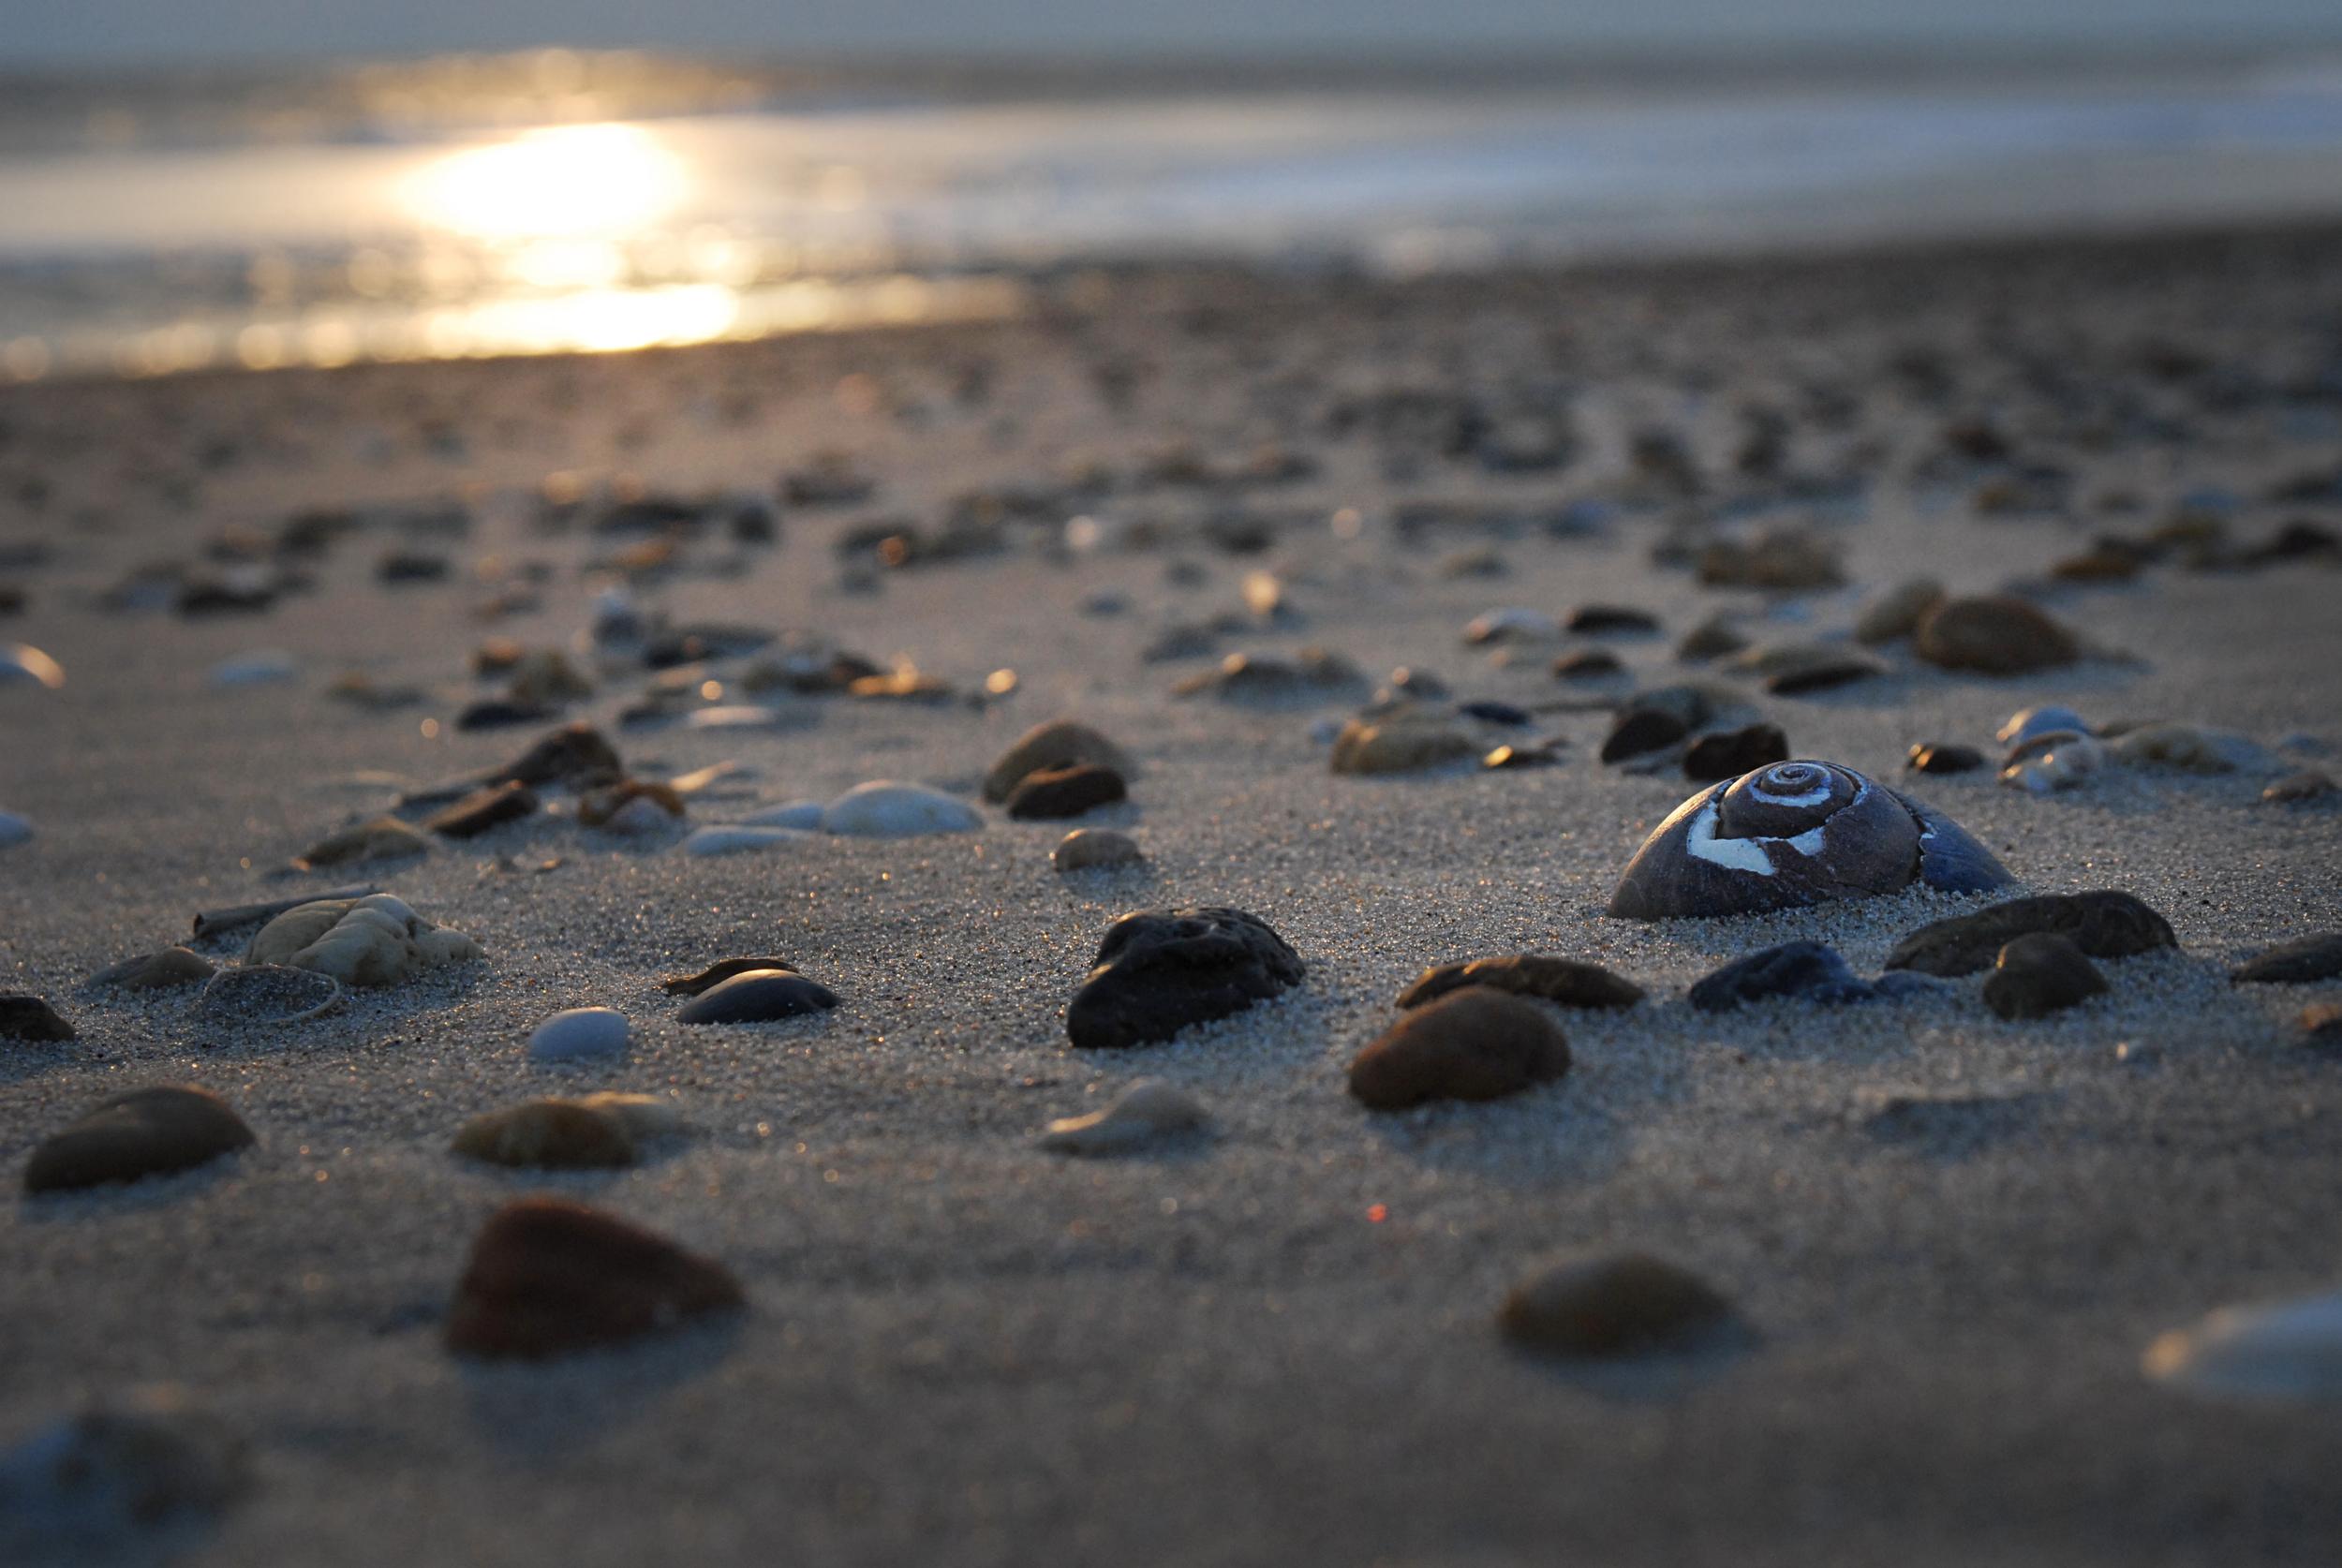 On Delmarva: Atlantic sunrise